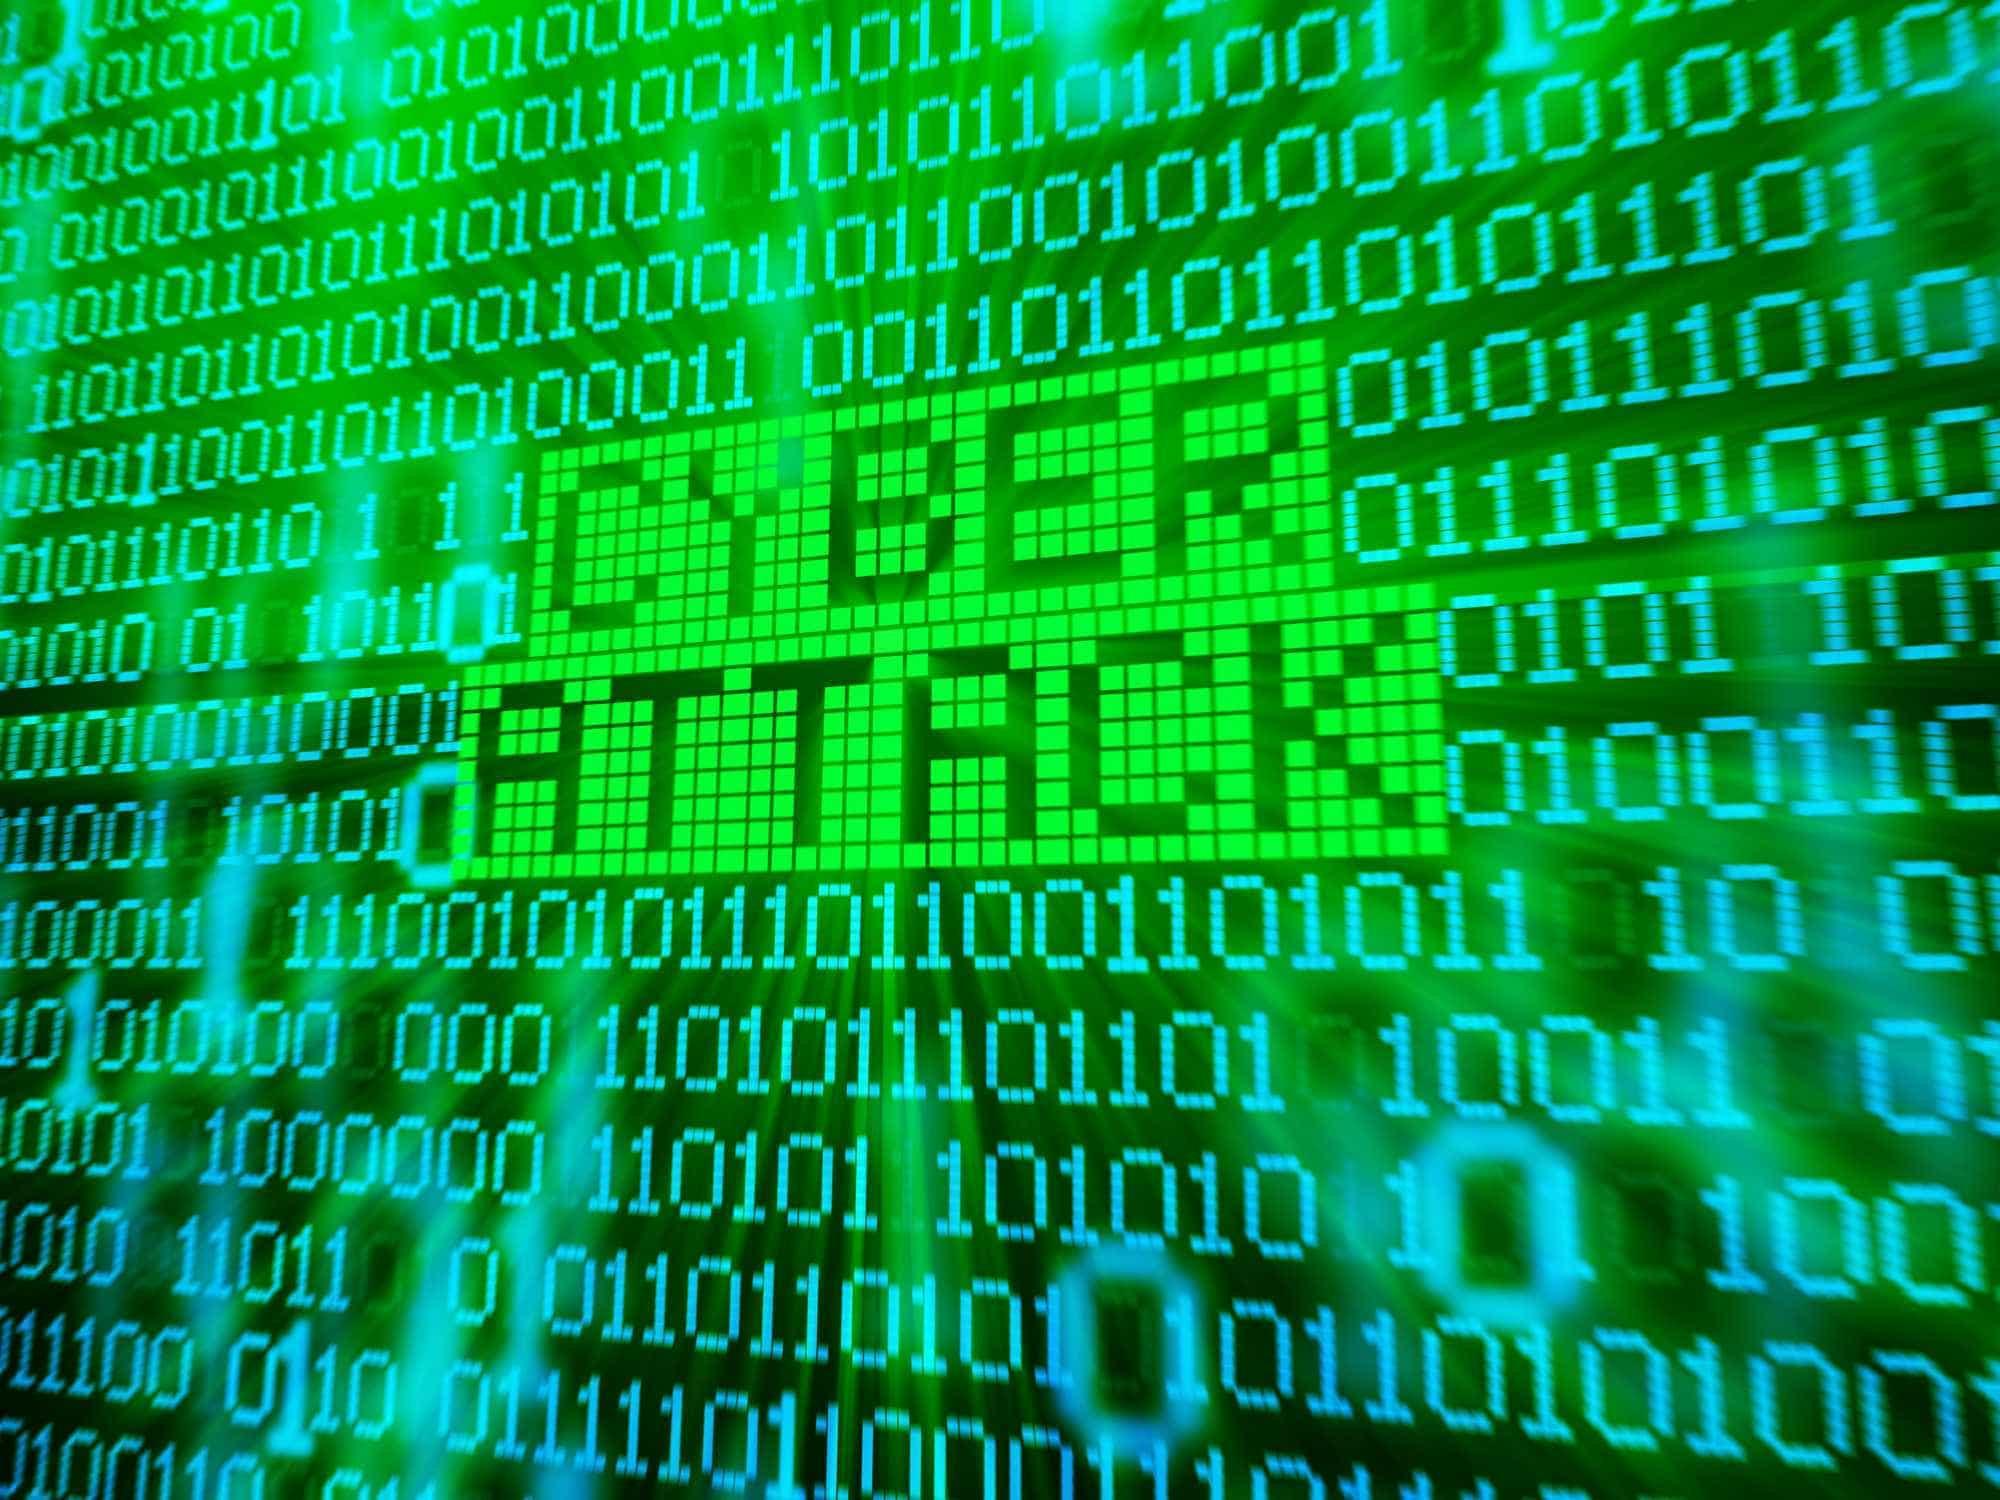 Neurocientista prevê que próxima guerra mundial será entre hackers